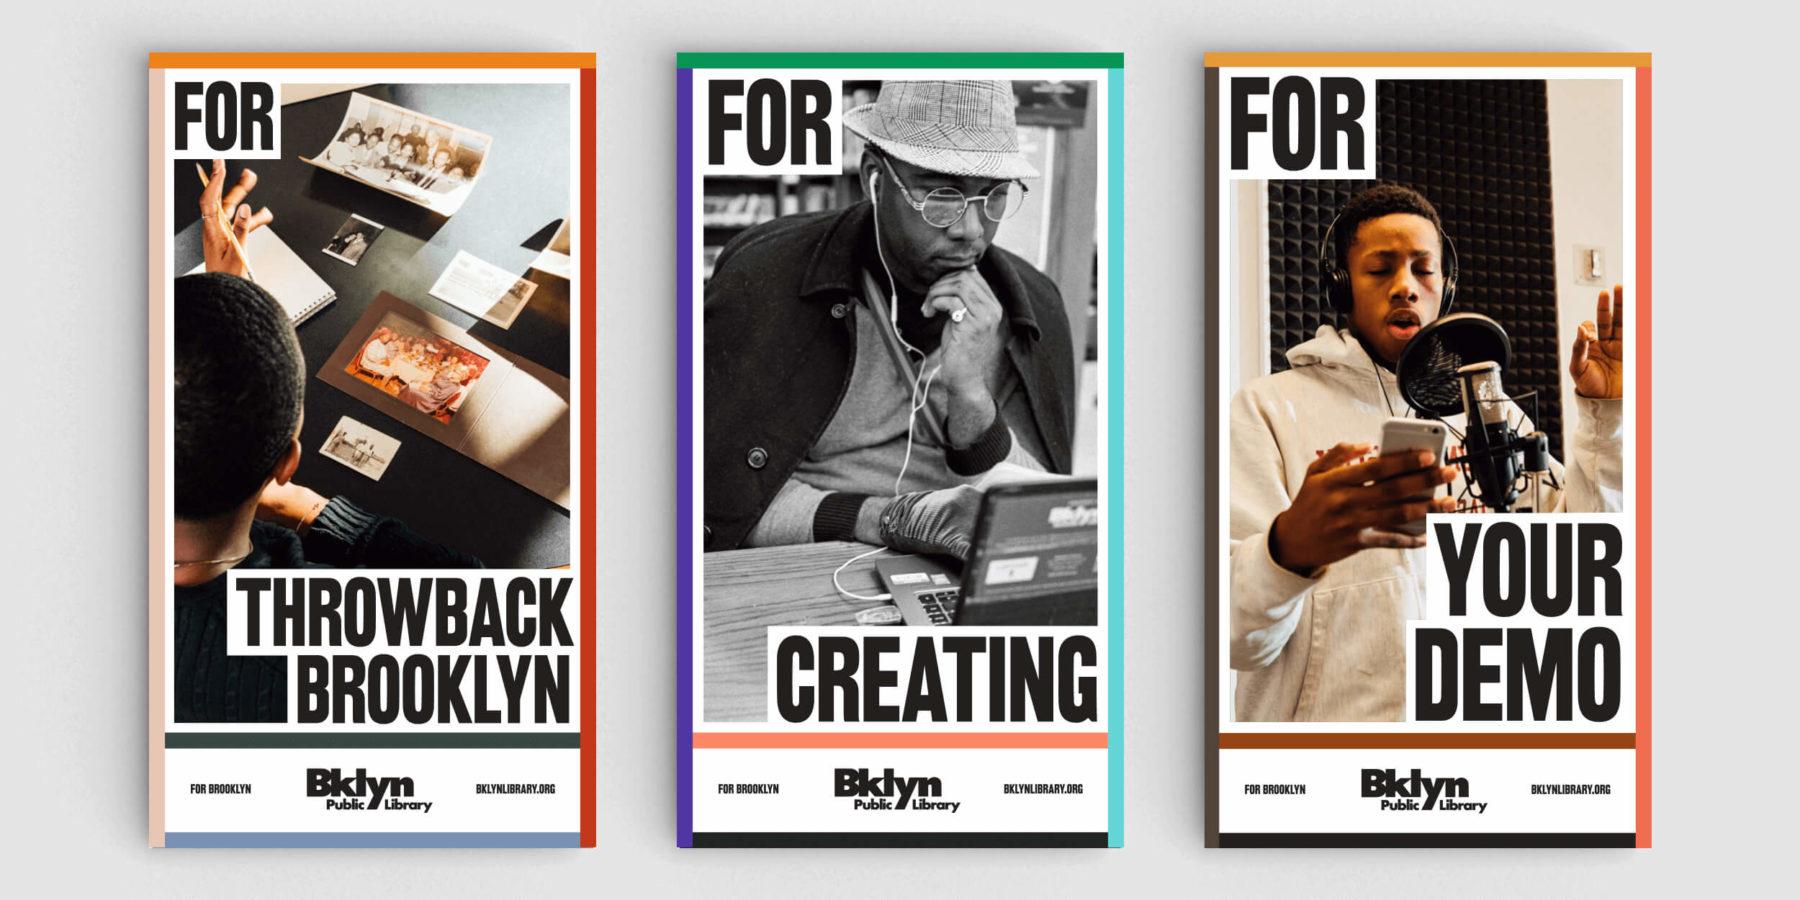 brooklyn-public-library-advertising-campaign-splash-image-b-1800x0-c-default.jpg